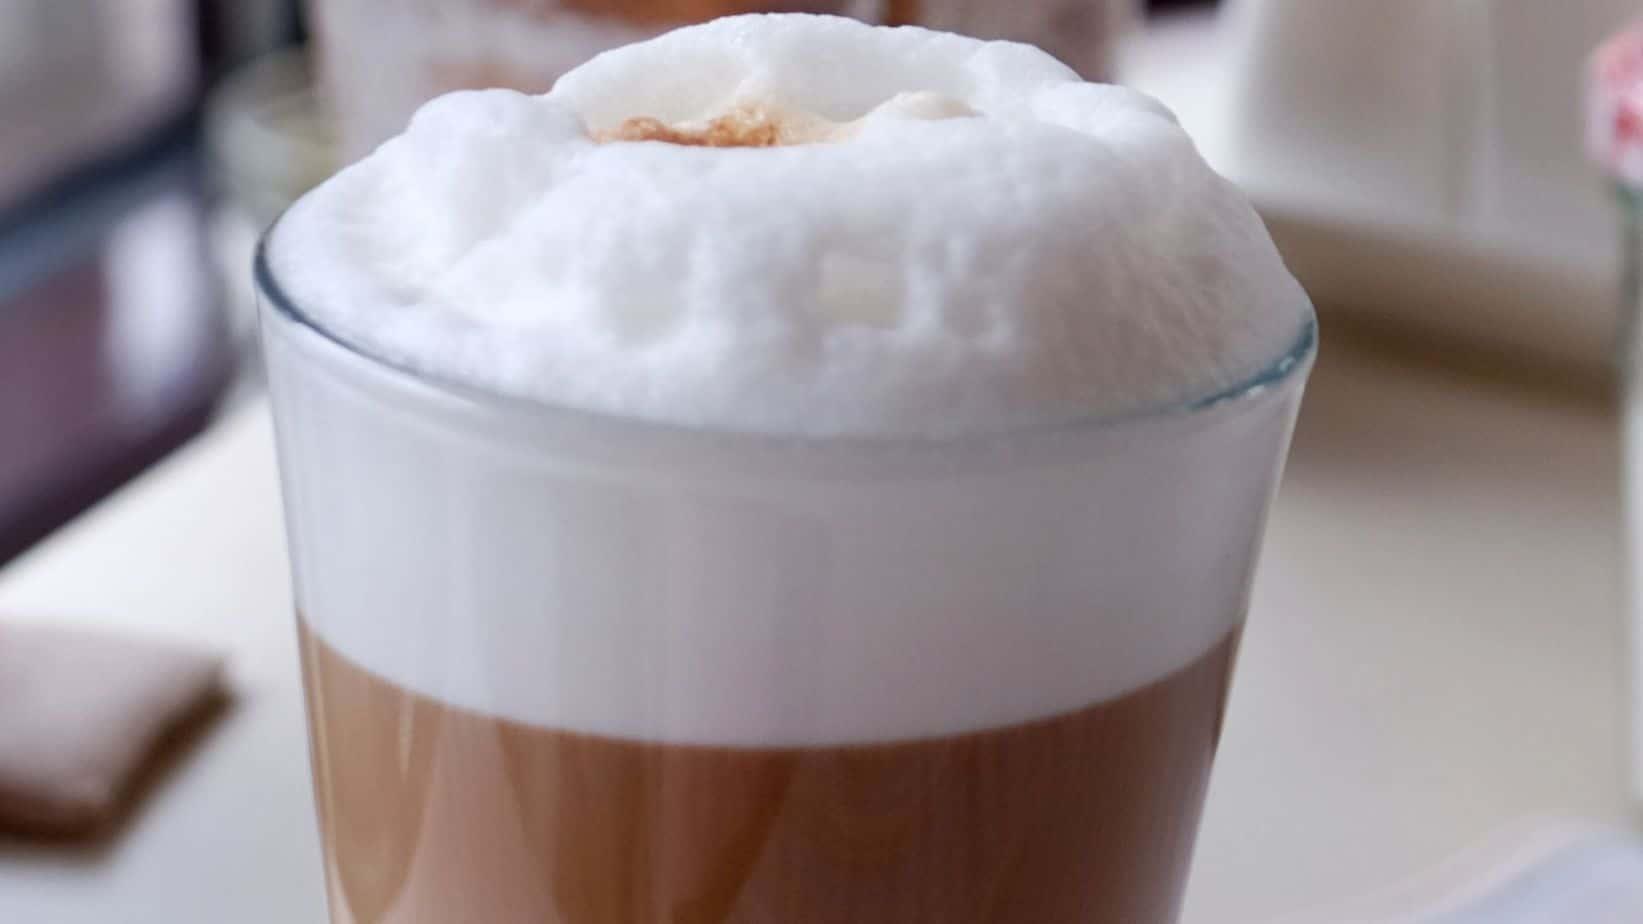 How to Make Sweet Cream Cold Foam